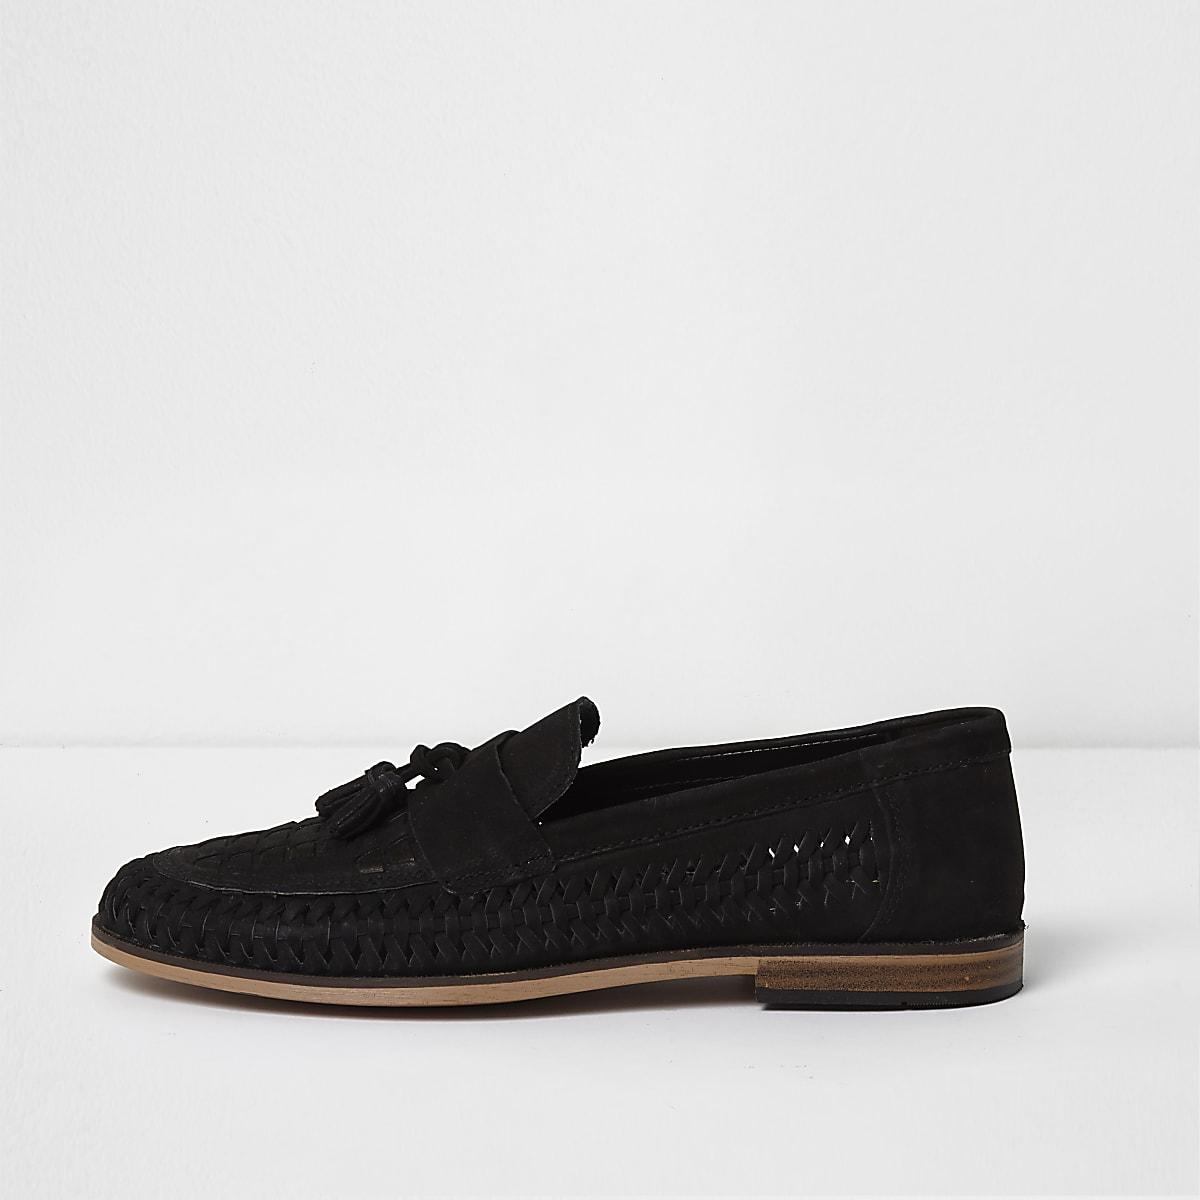 Black suede woven tassel loafers